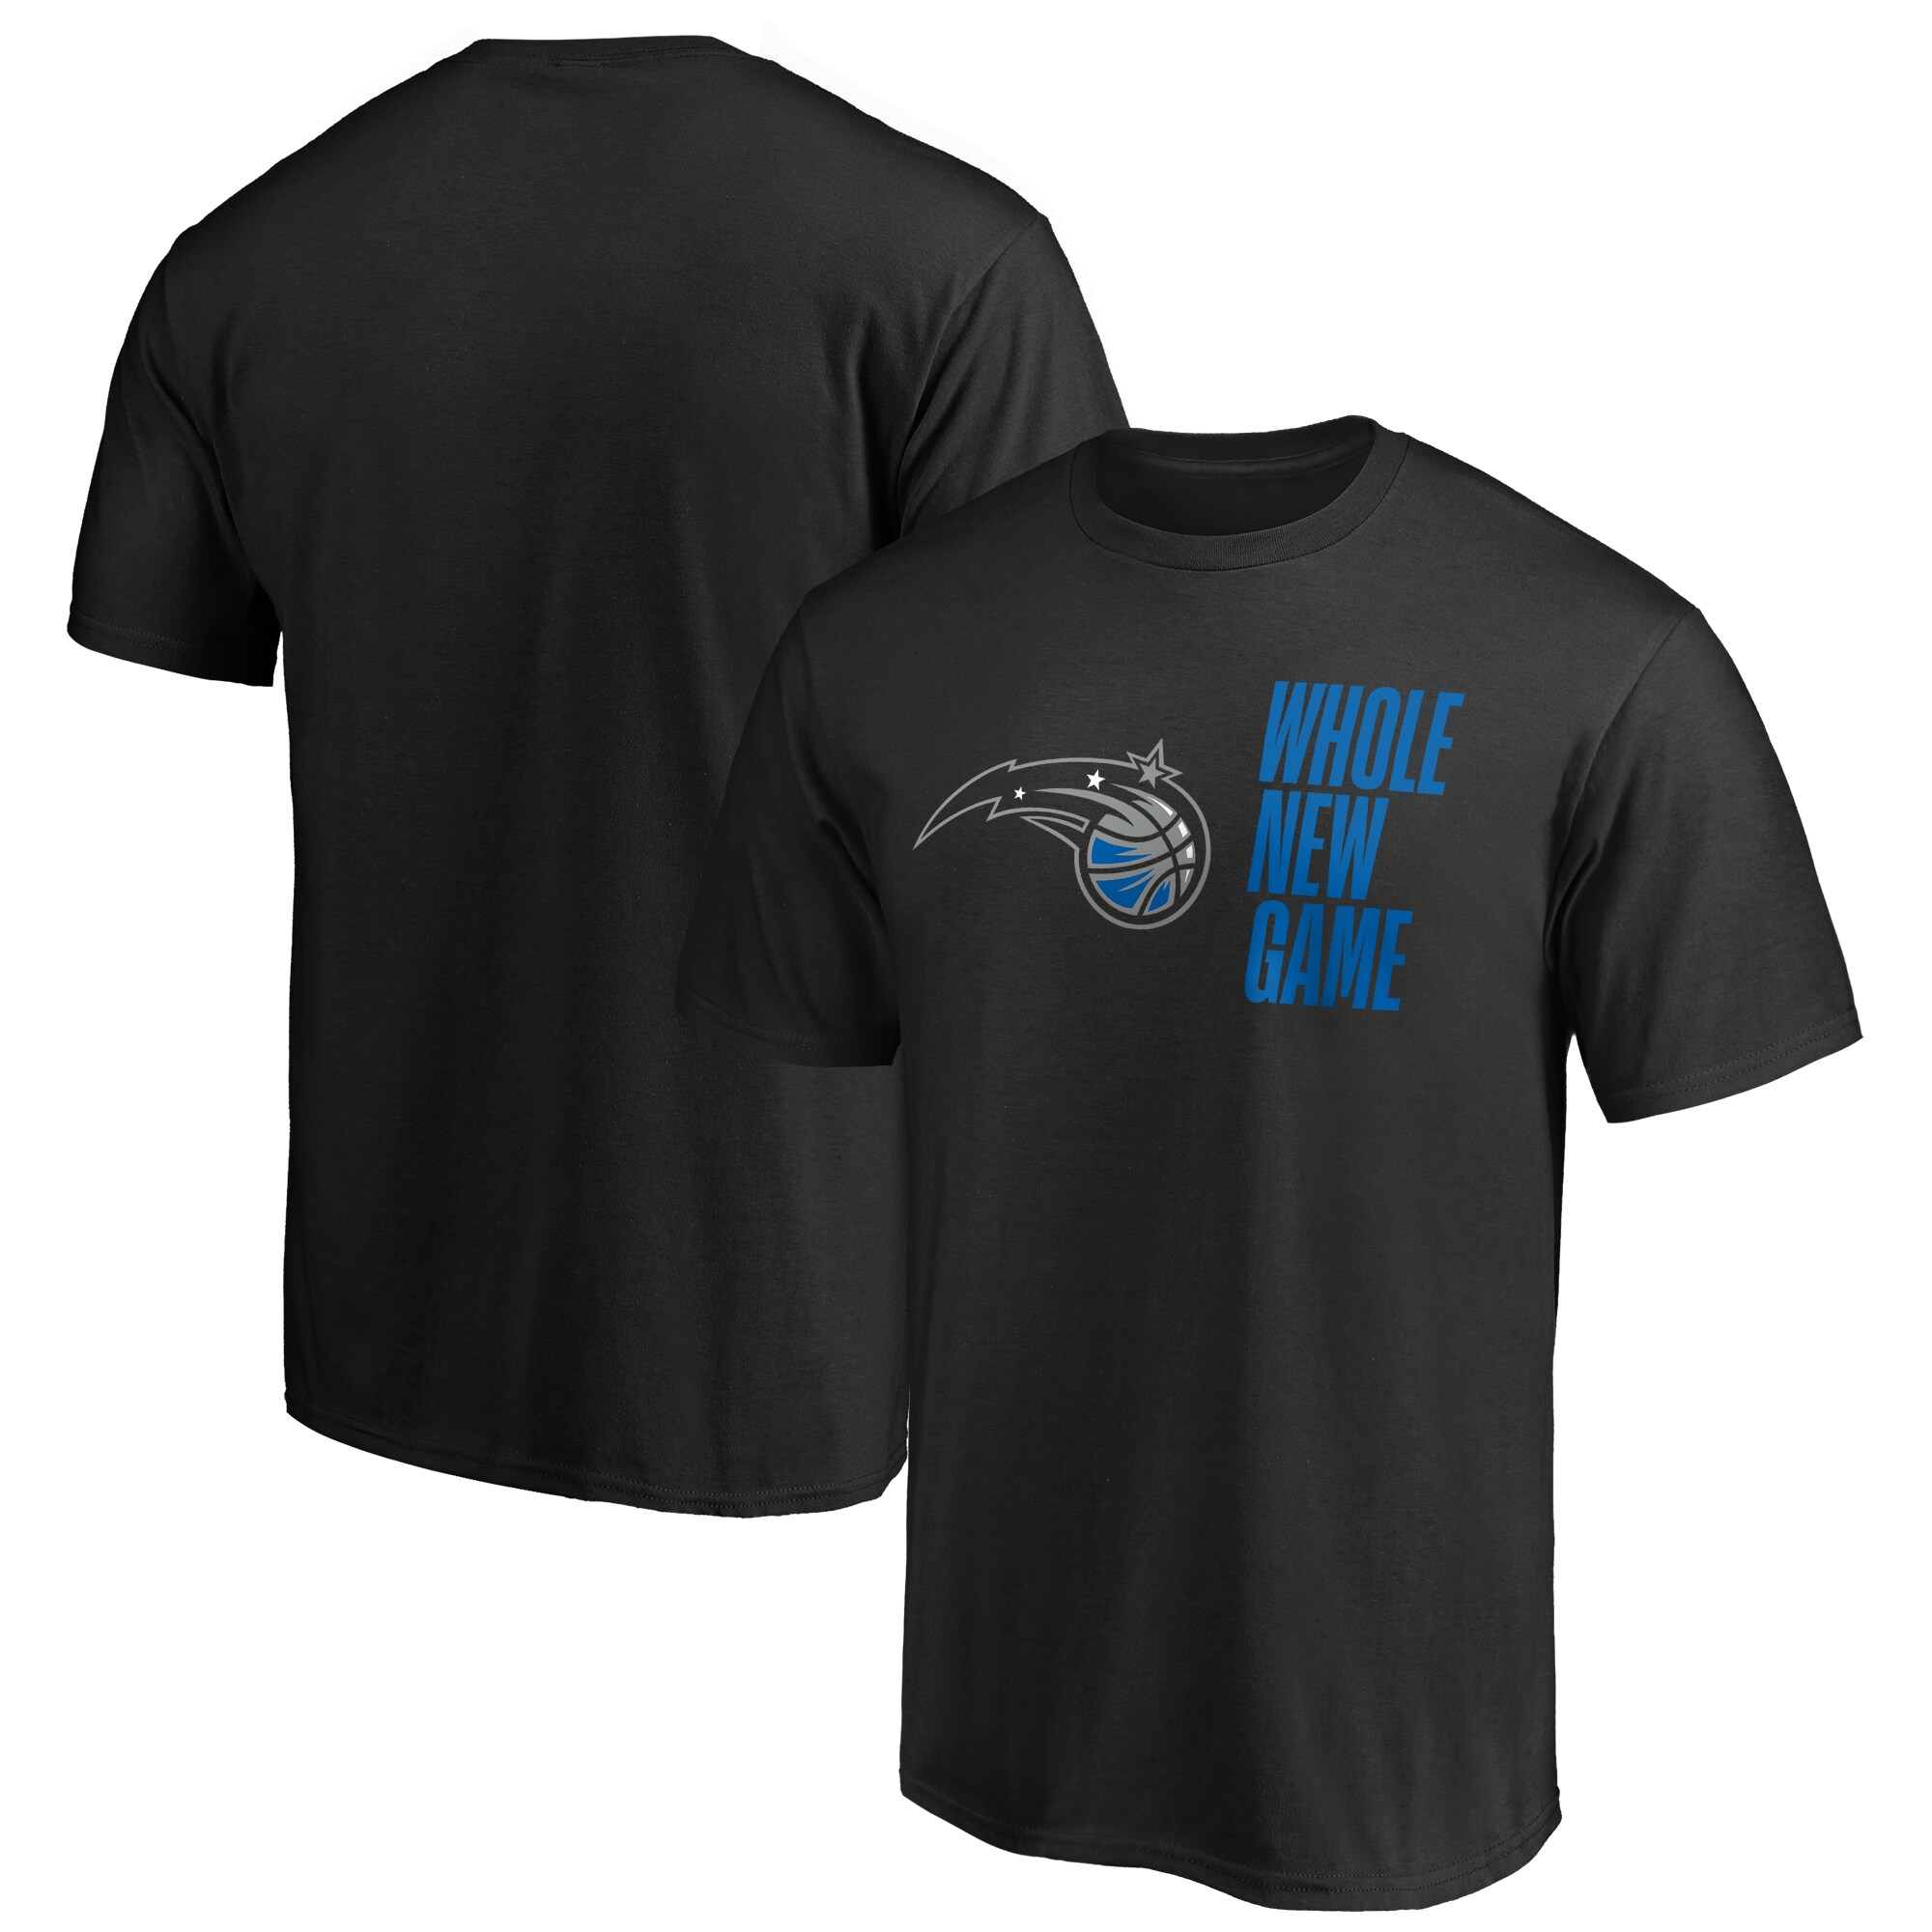 Orlando Magic Fanatics Branded Whole New Game Team T-Shirt - Black